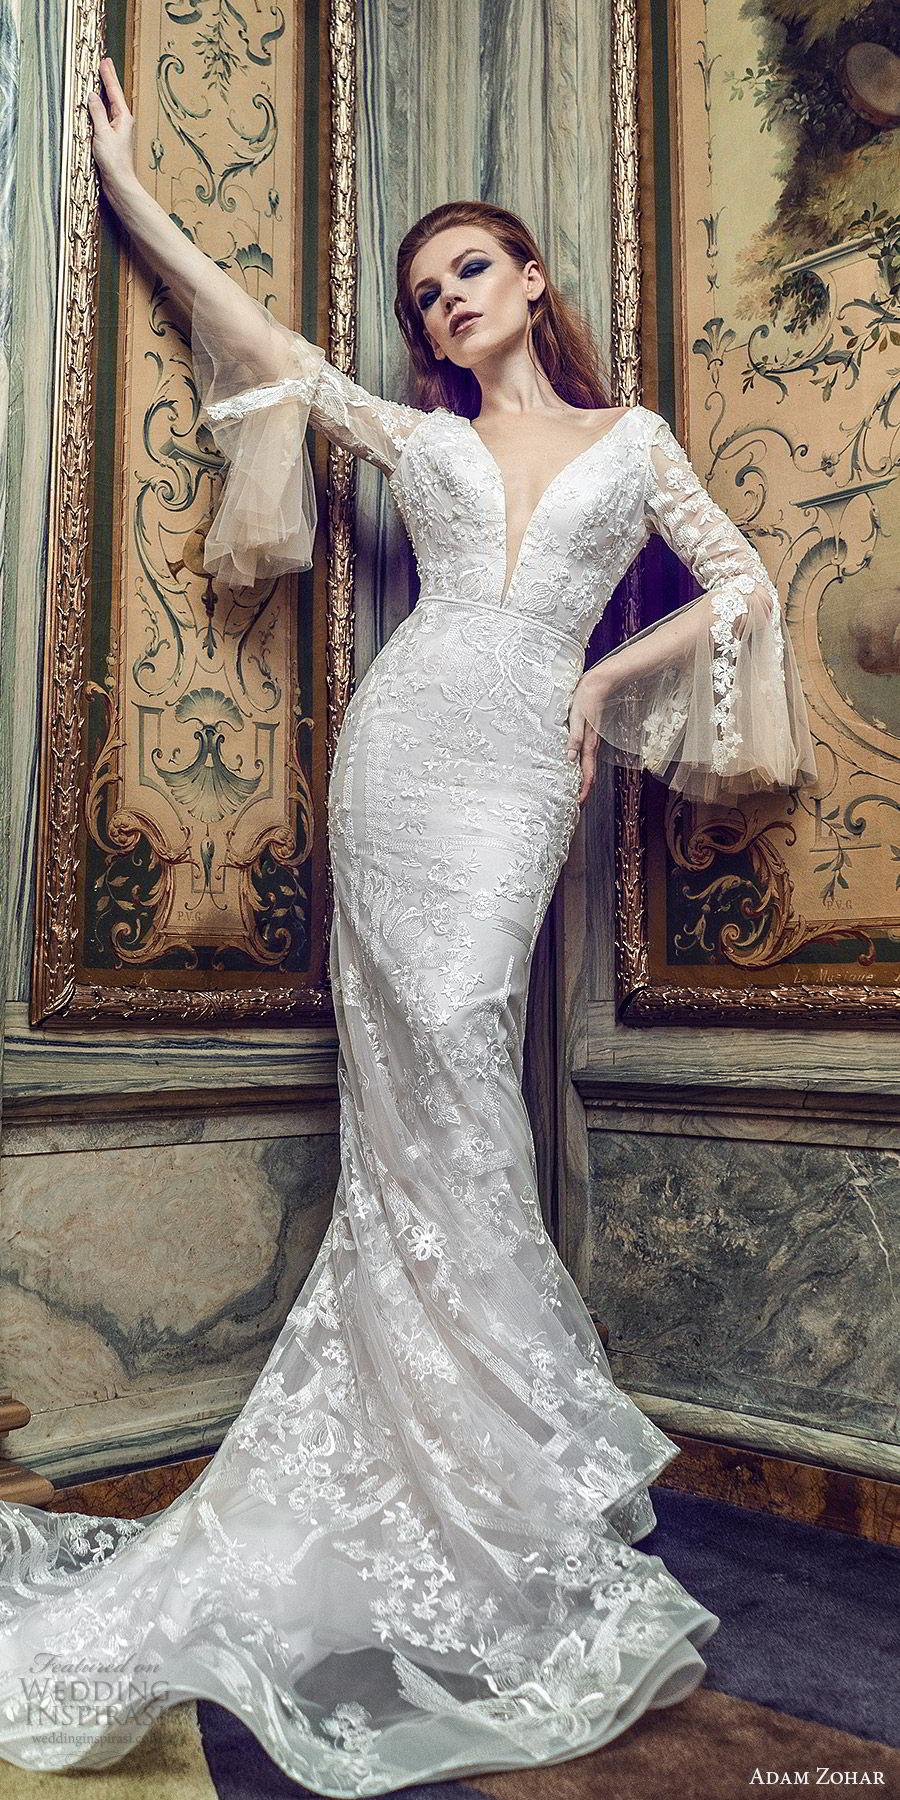 adam zohar 2020 bridal long bell sleeves deep v neckline fully embellished lace sheath mermaid wedding dress (3) boho chic romantic chapel train mv